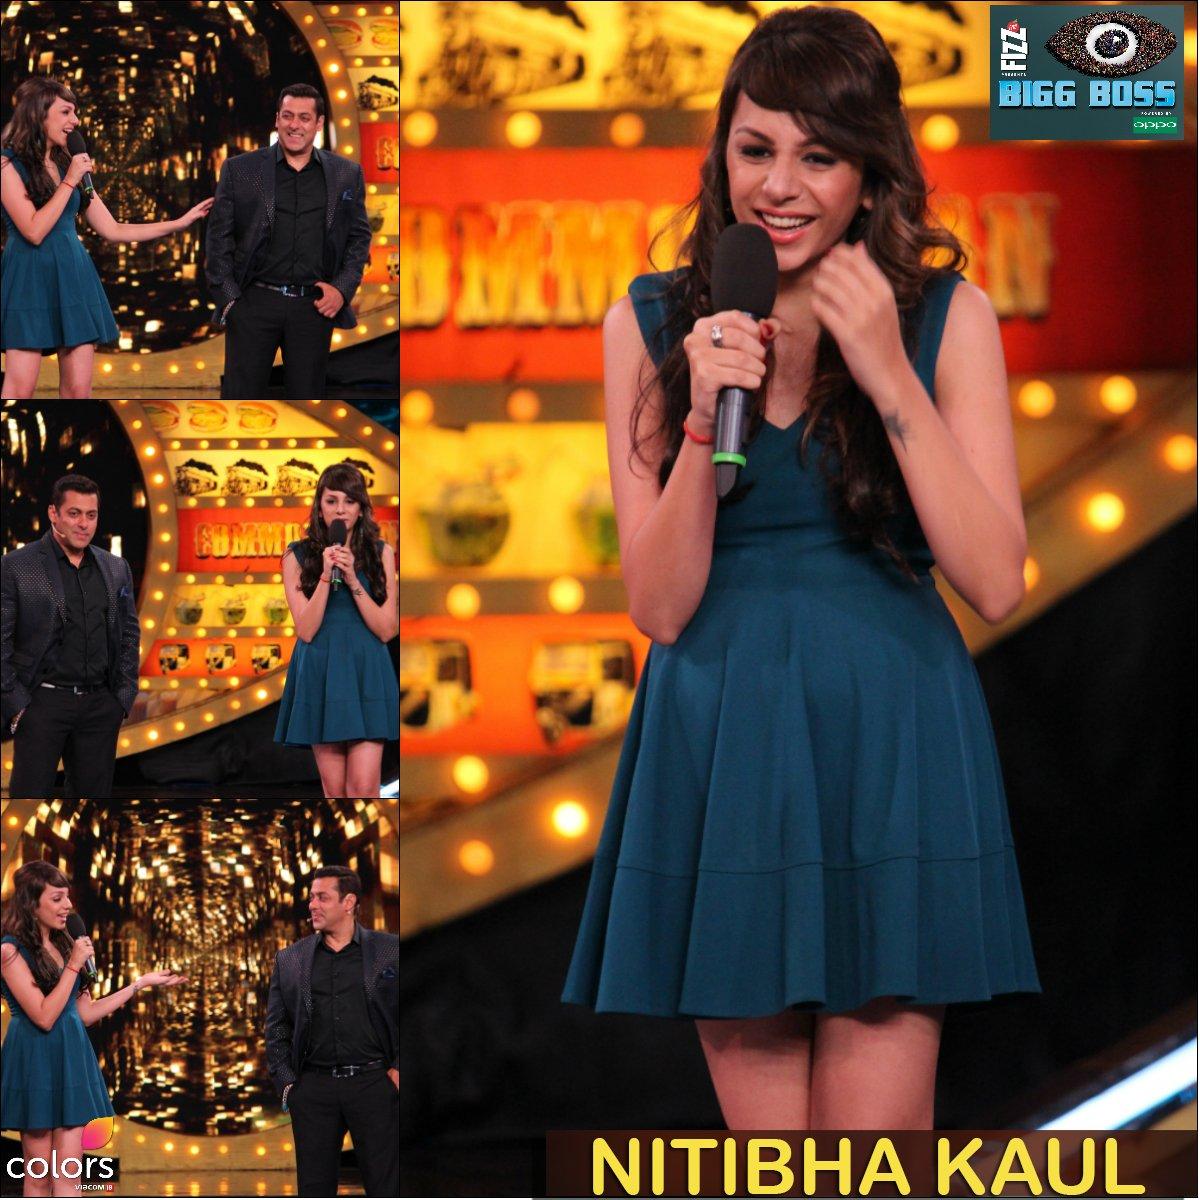 Nitibha Kaul,hd,images,photos,Bigg boss 10,Big Boss 10,bb10,pictures,photos,images,contestant,hot,sexy